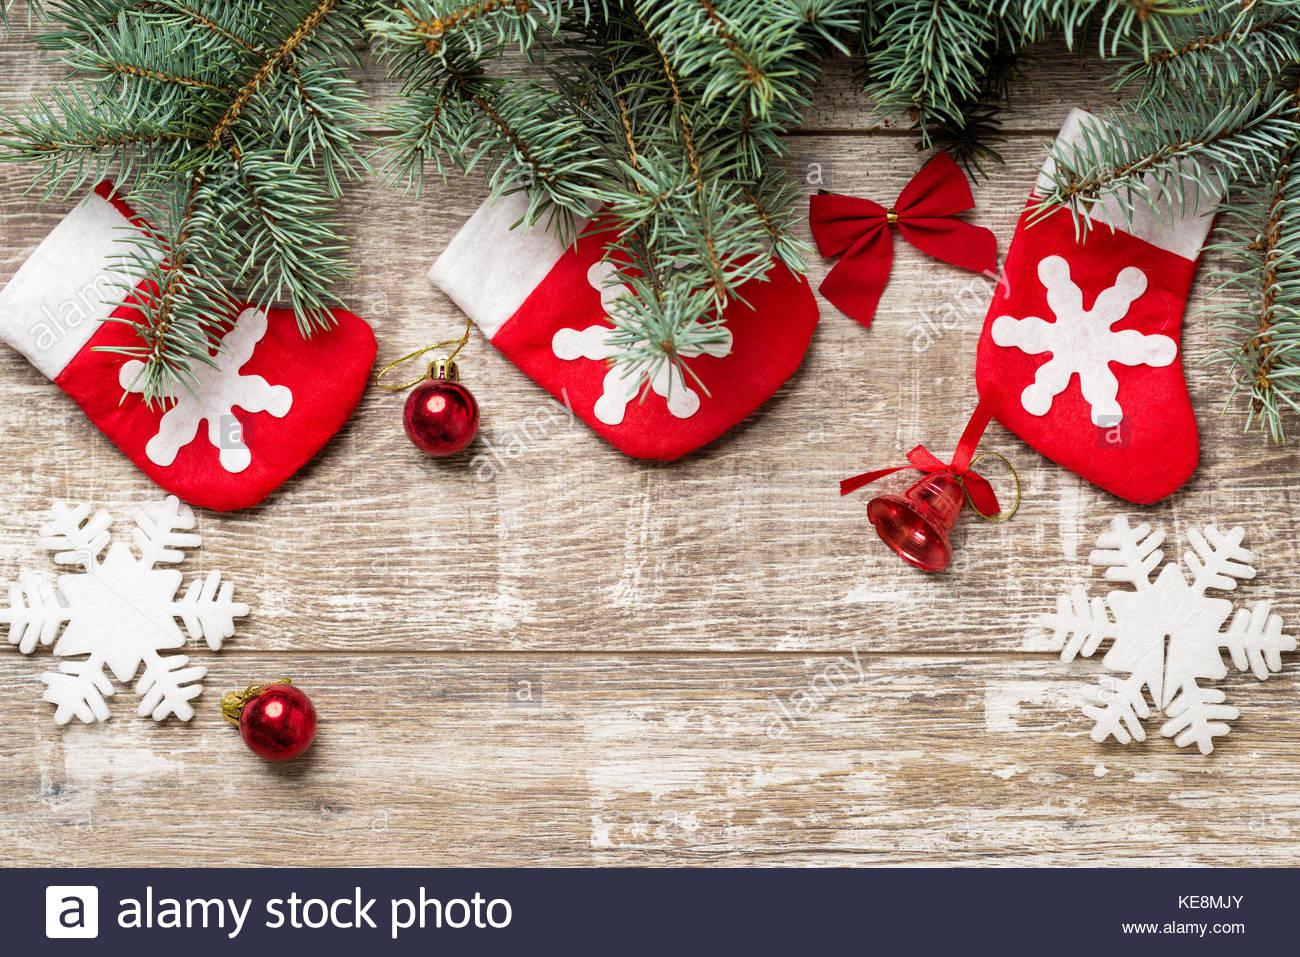 Christmas backgrounds 2018 Stock Photo 163690323   Alamy 1300x957